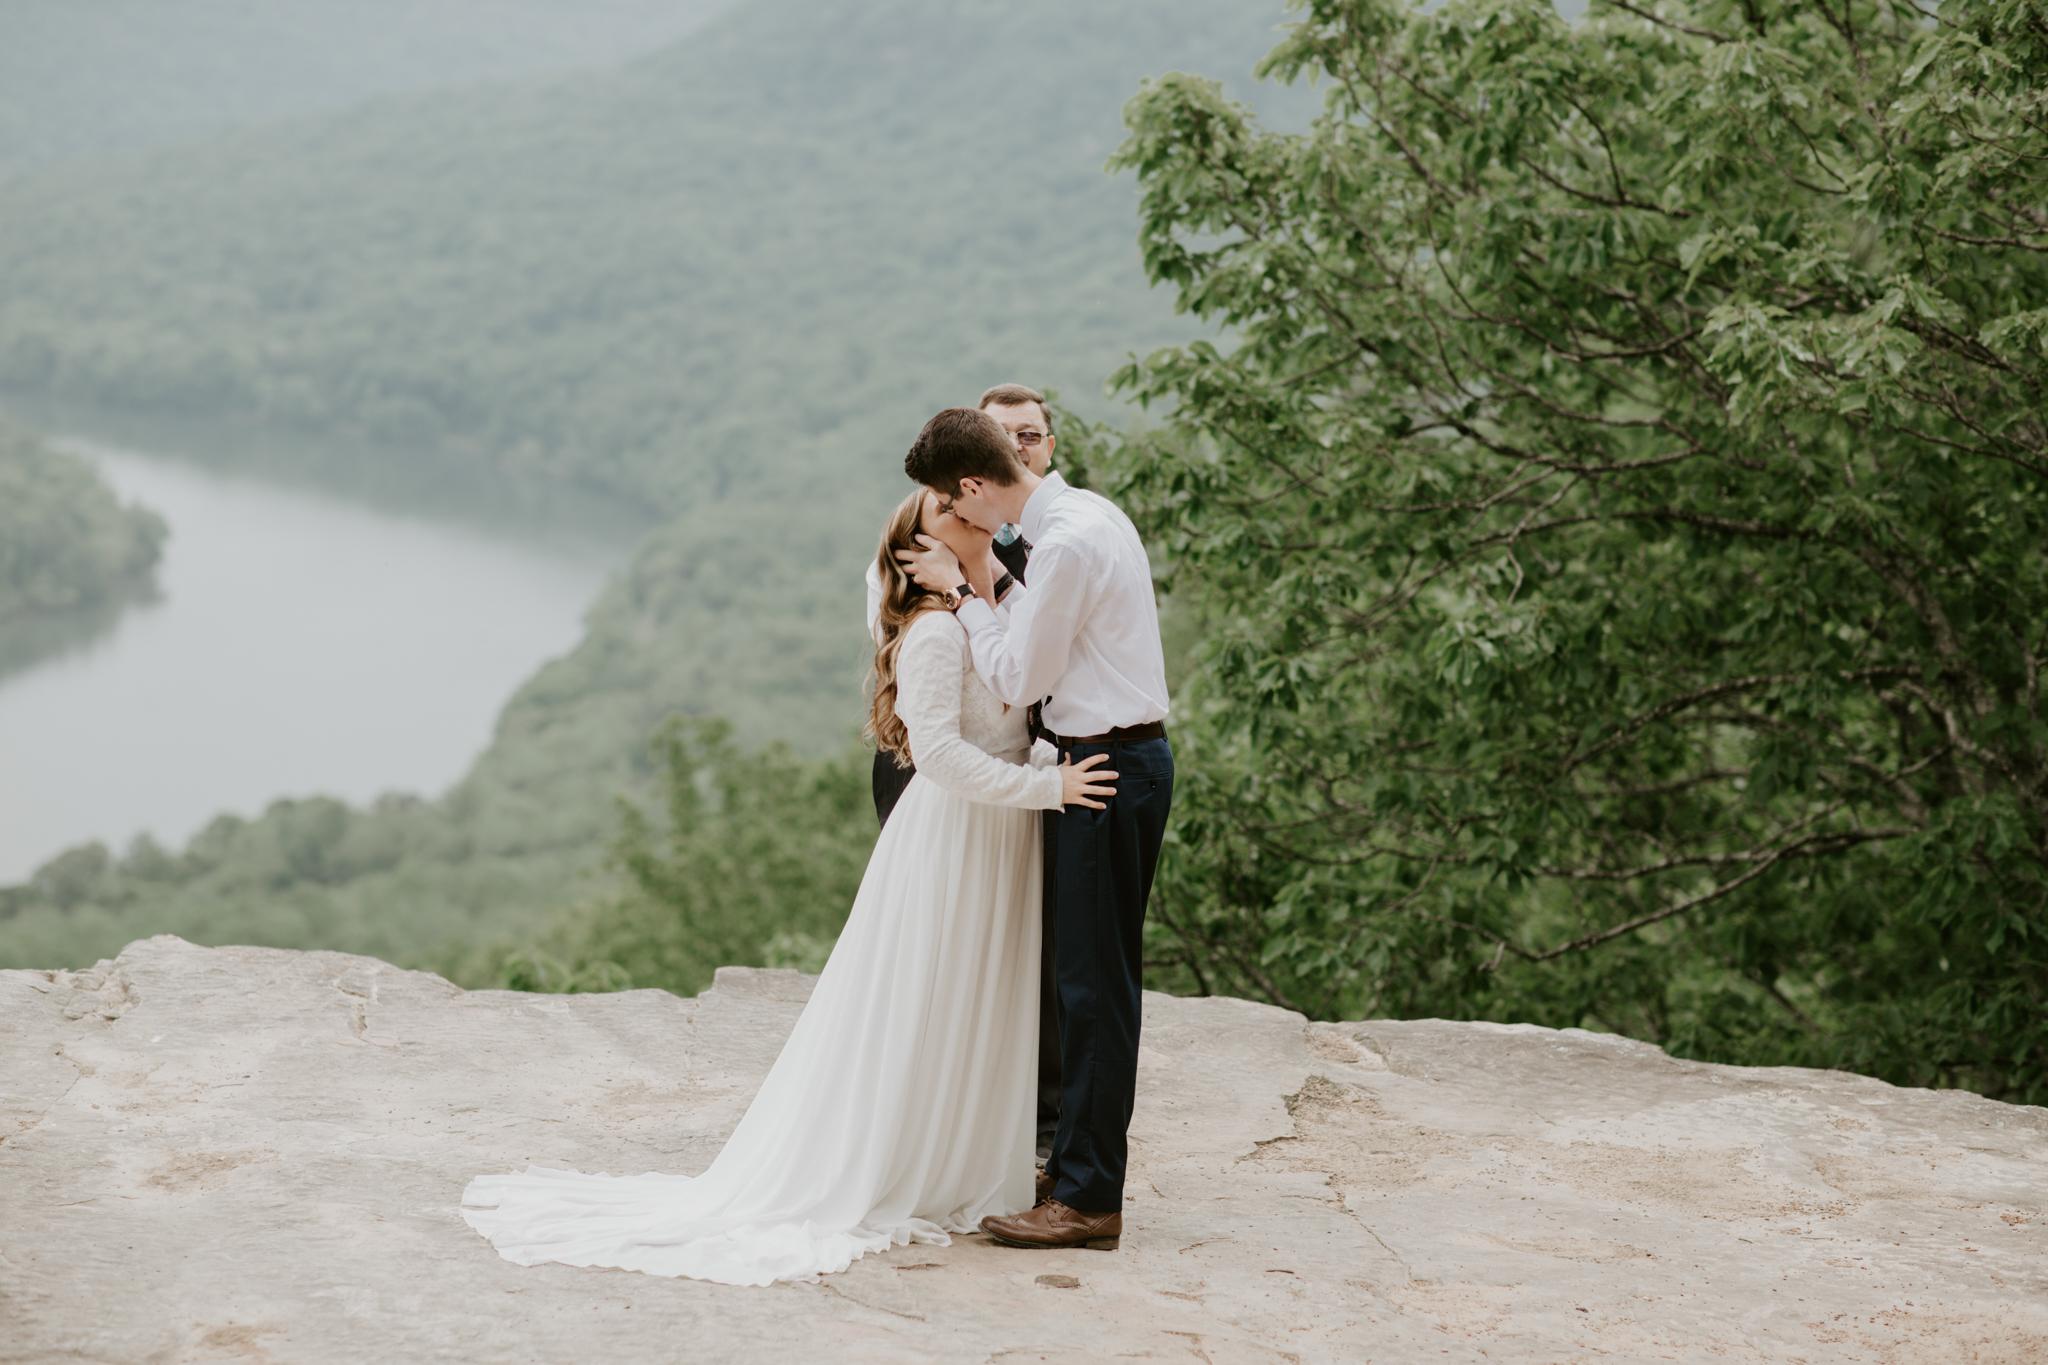 Lacey-Joe-Chattanooga-Nashville-Tennessee-Wedding-Elopement-Photographer-82.jpg